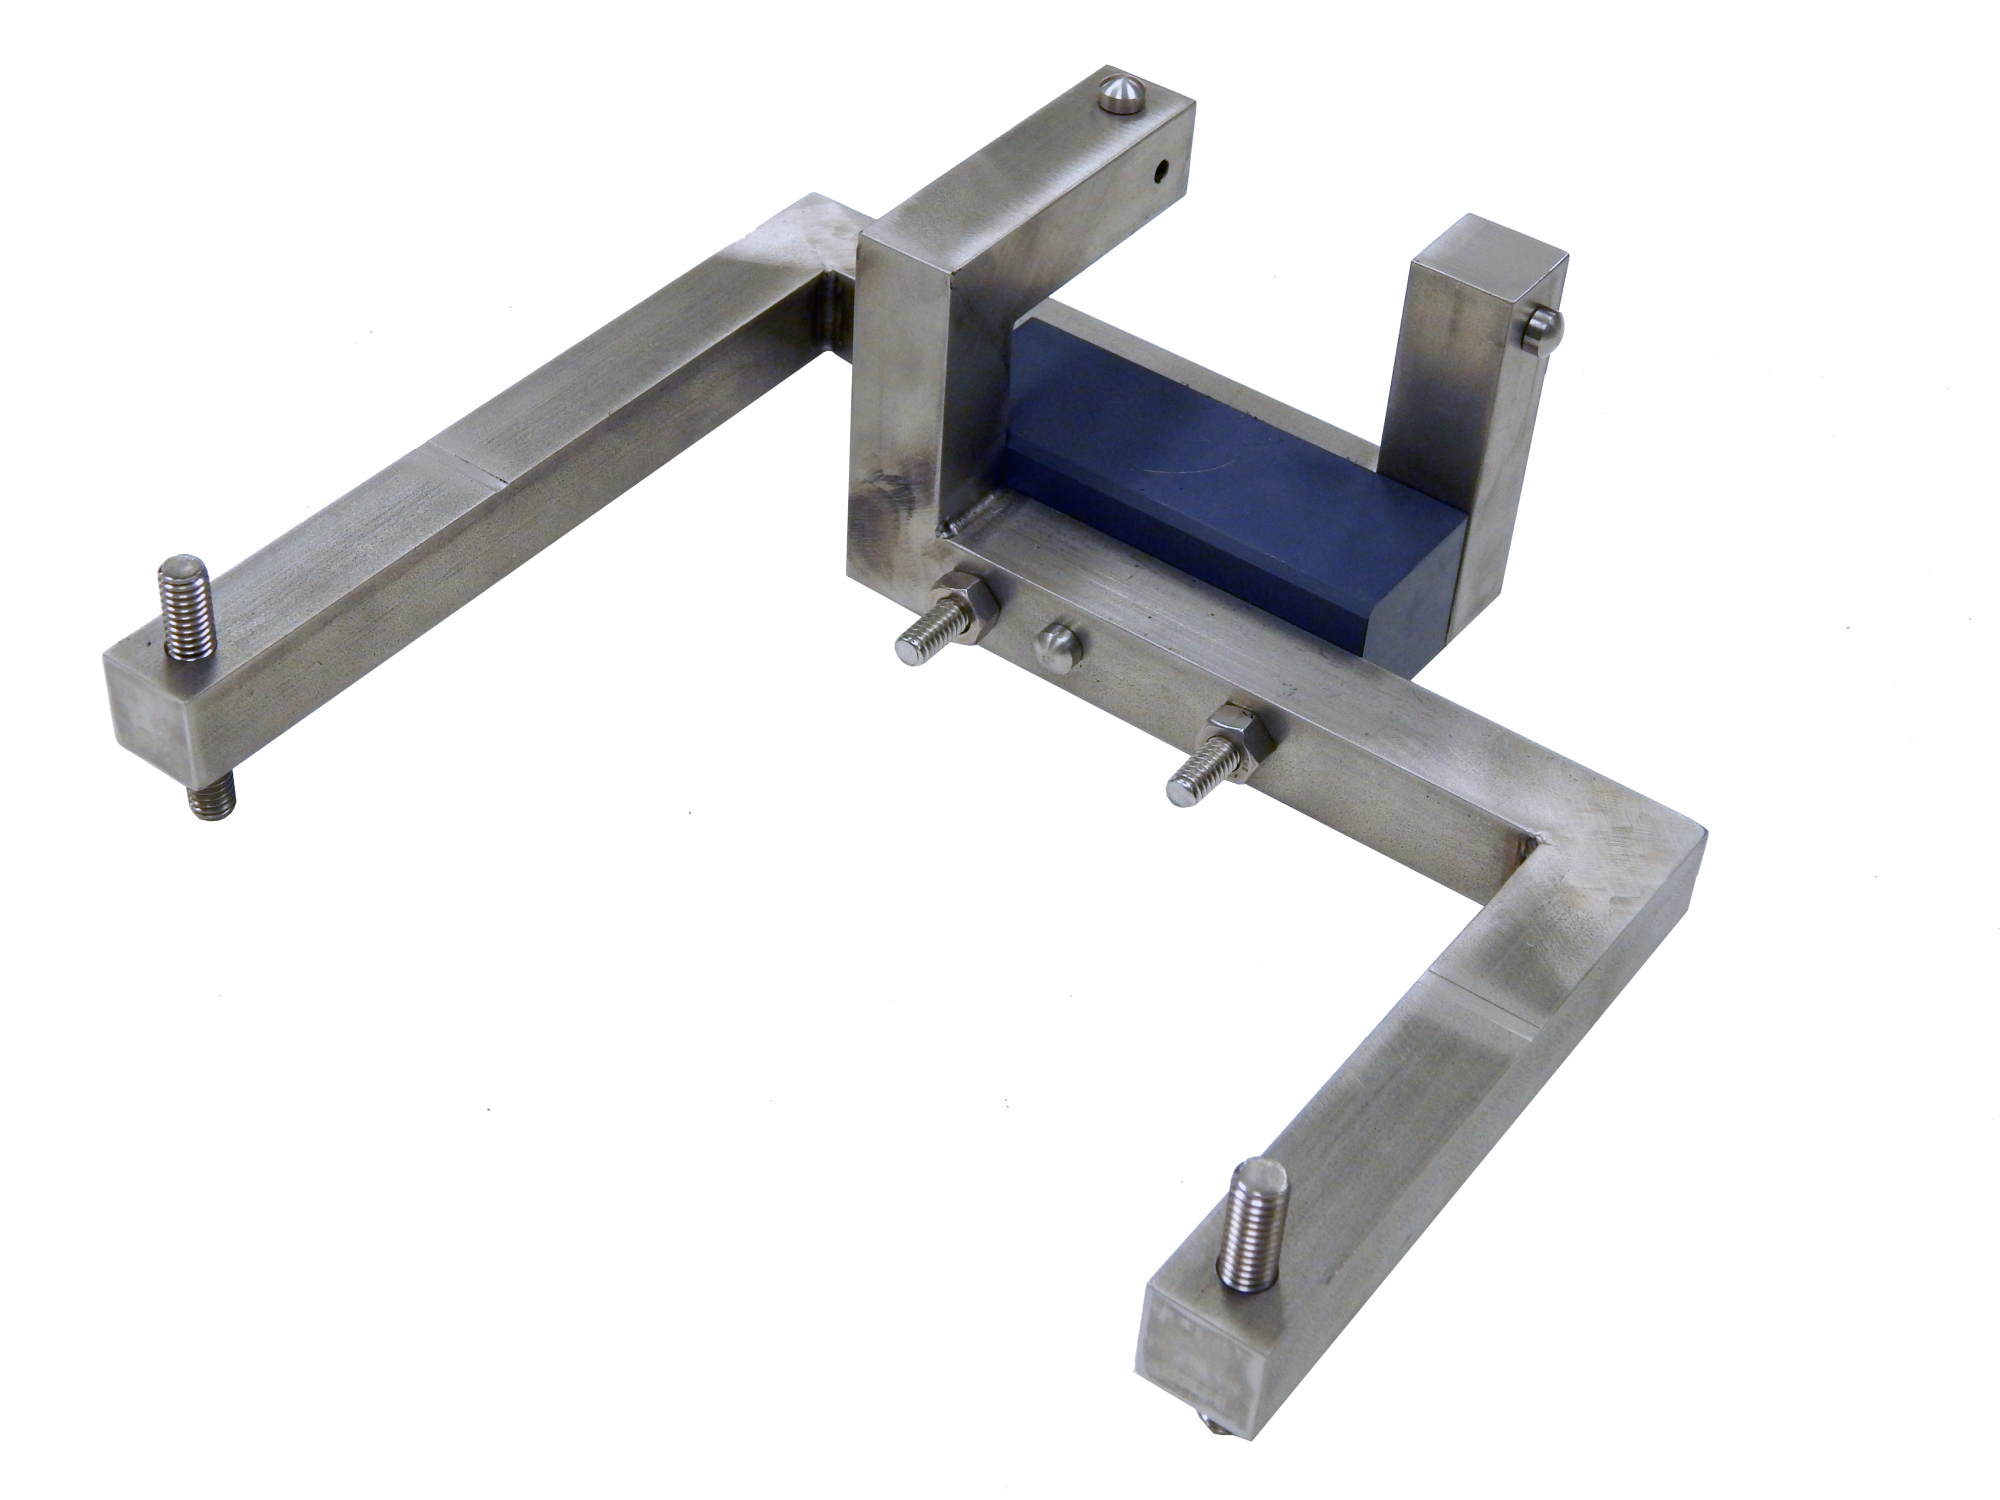 Image Crackmeter – RTV-3D